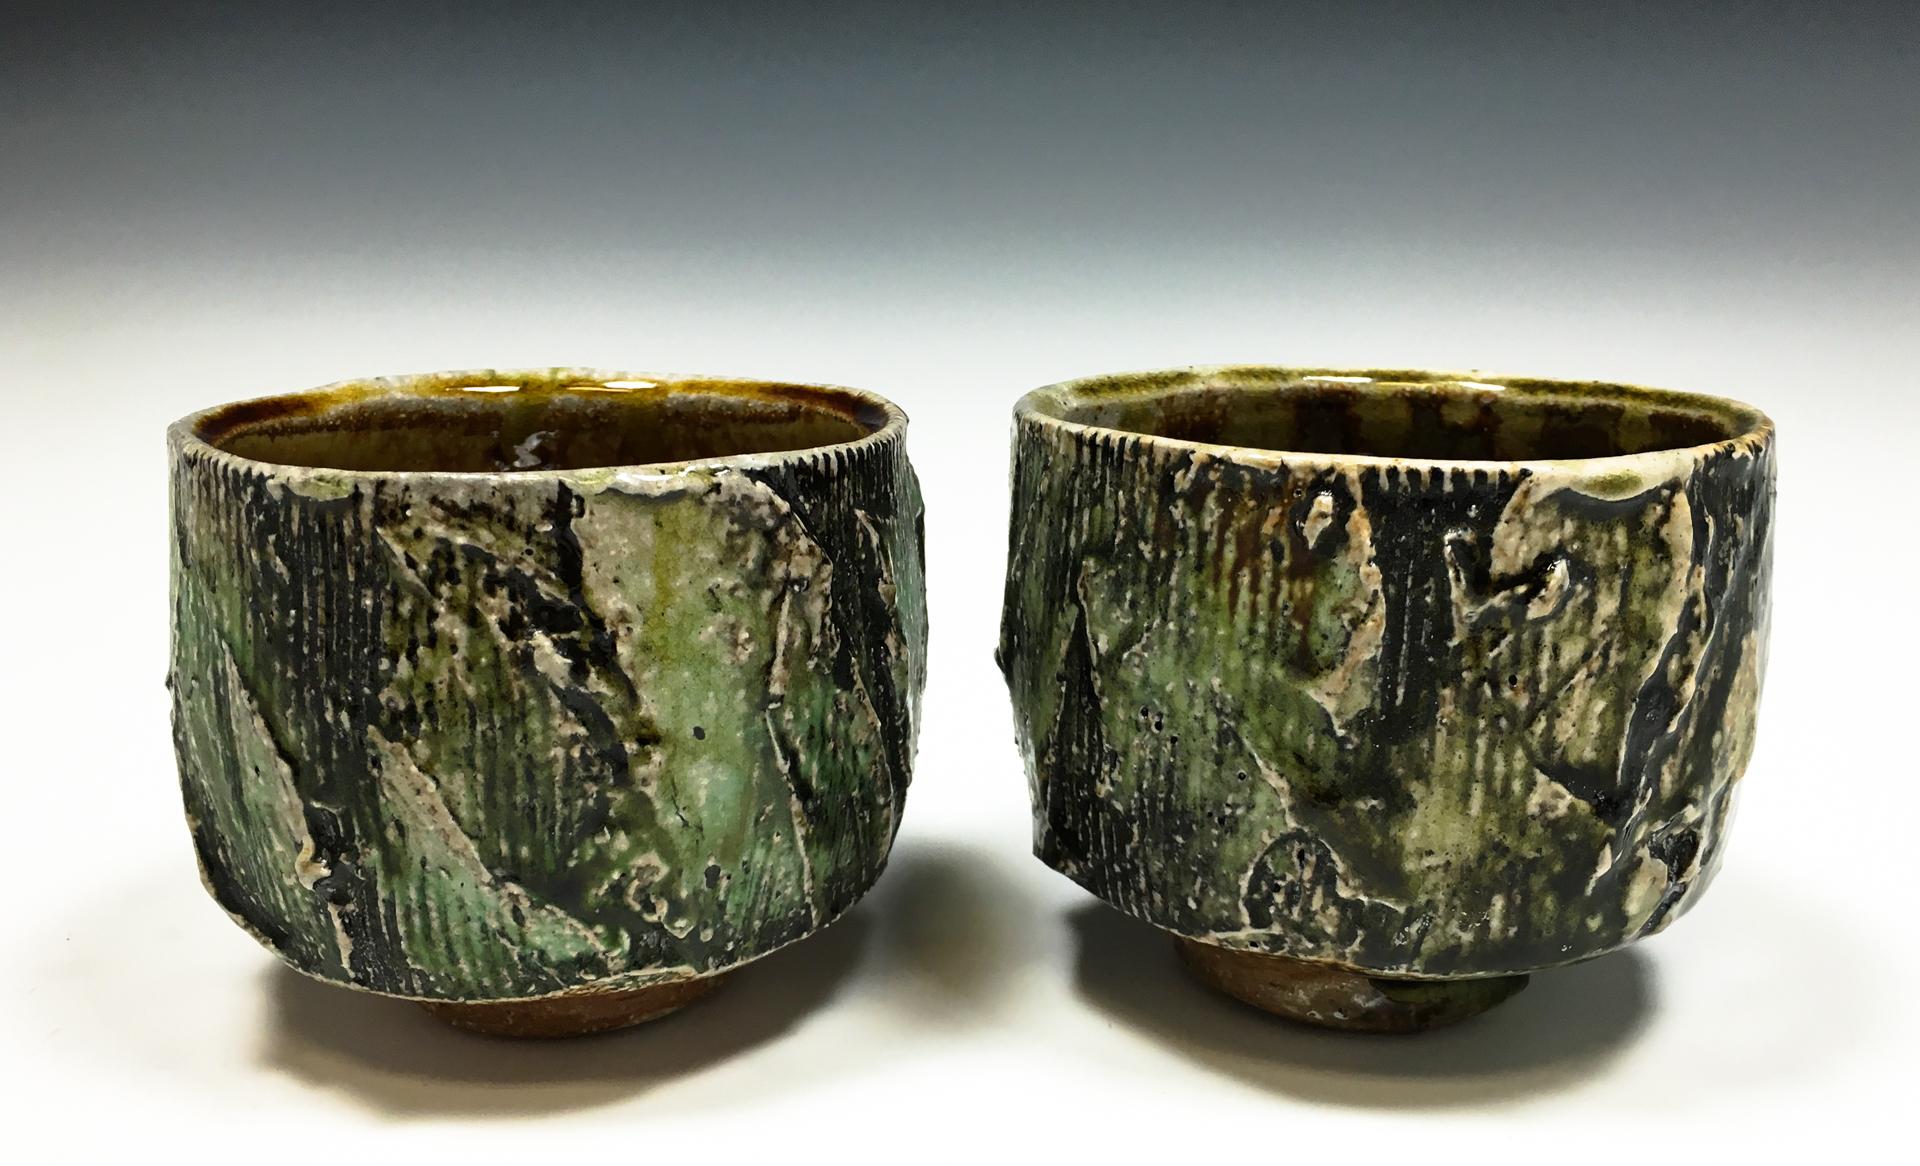 Green Cup Pair 12-15.jpg